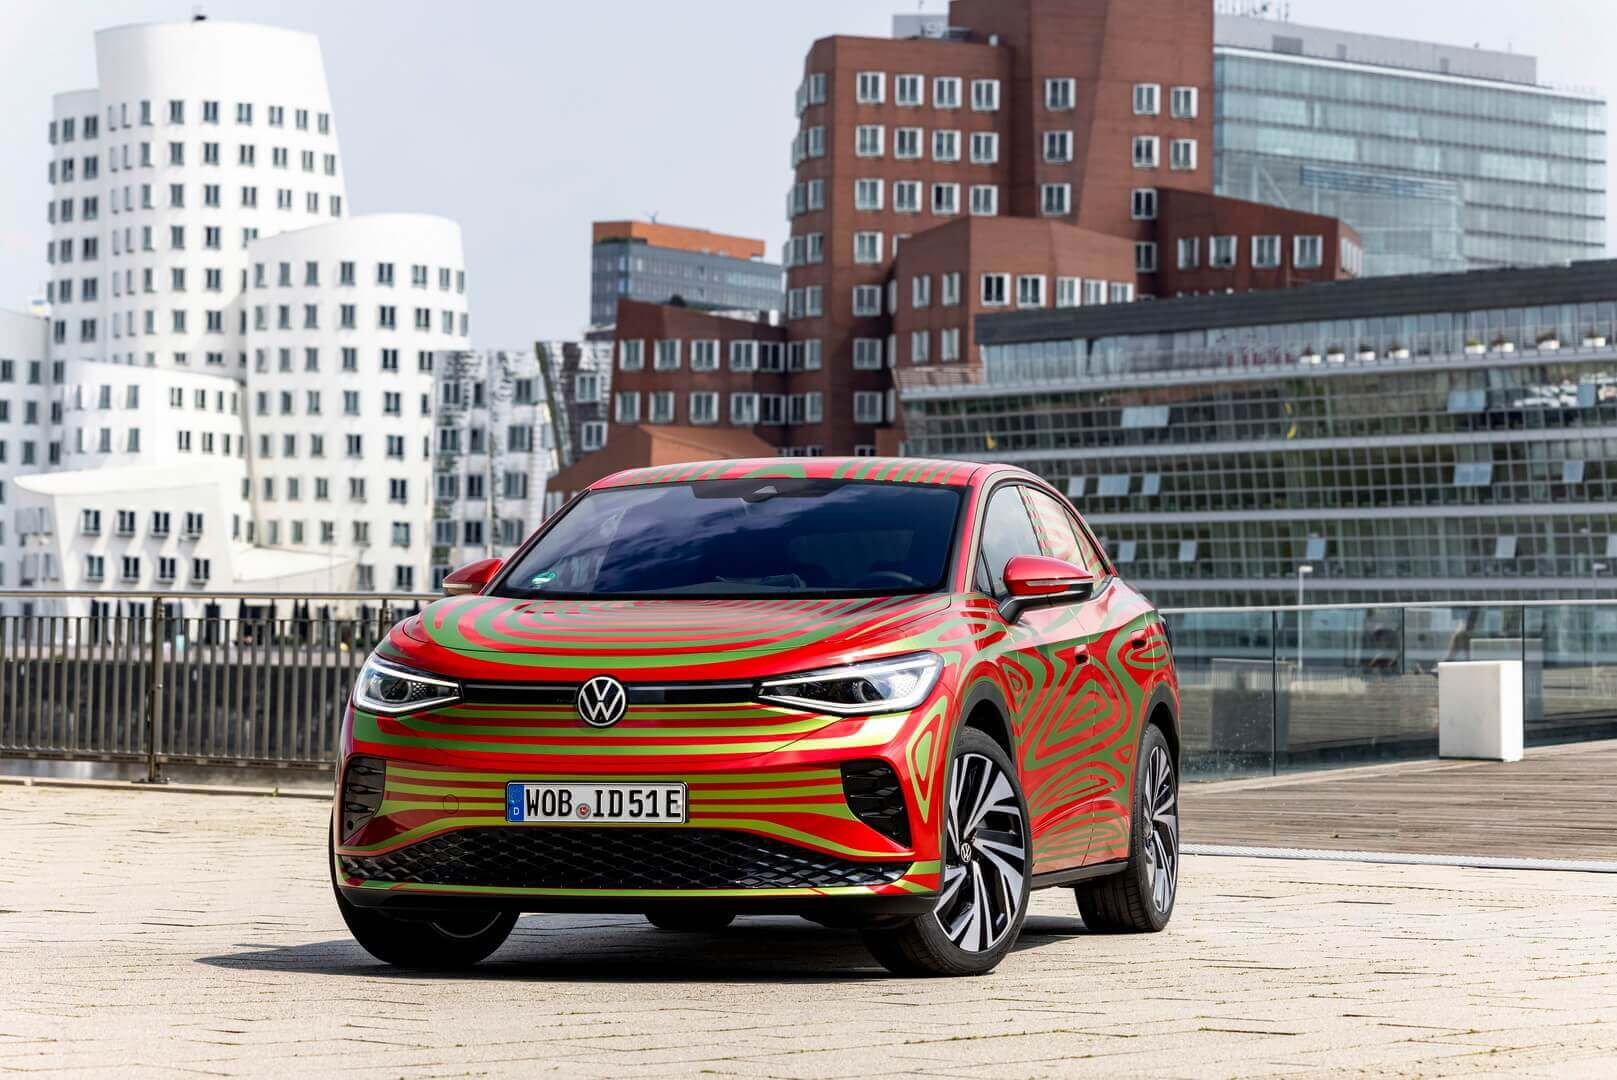 Концепт VW ID.5 GTX раскрыт в преддверии дебюта на IAA Mobility 2021